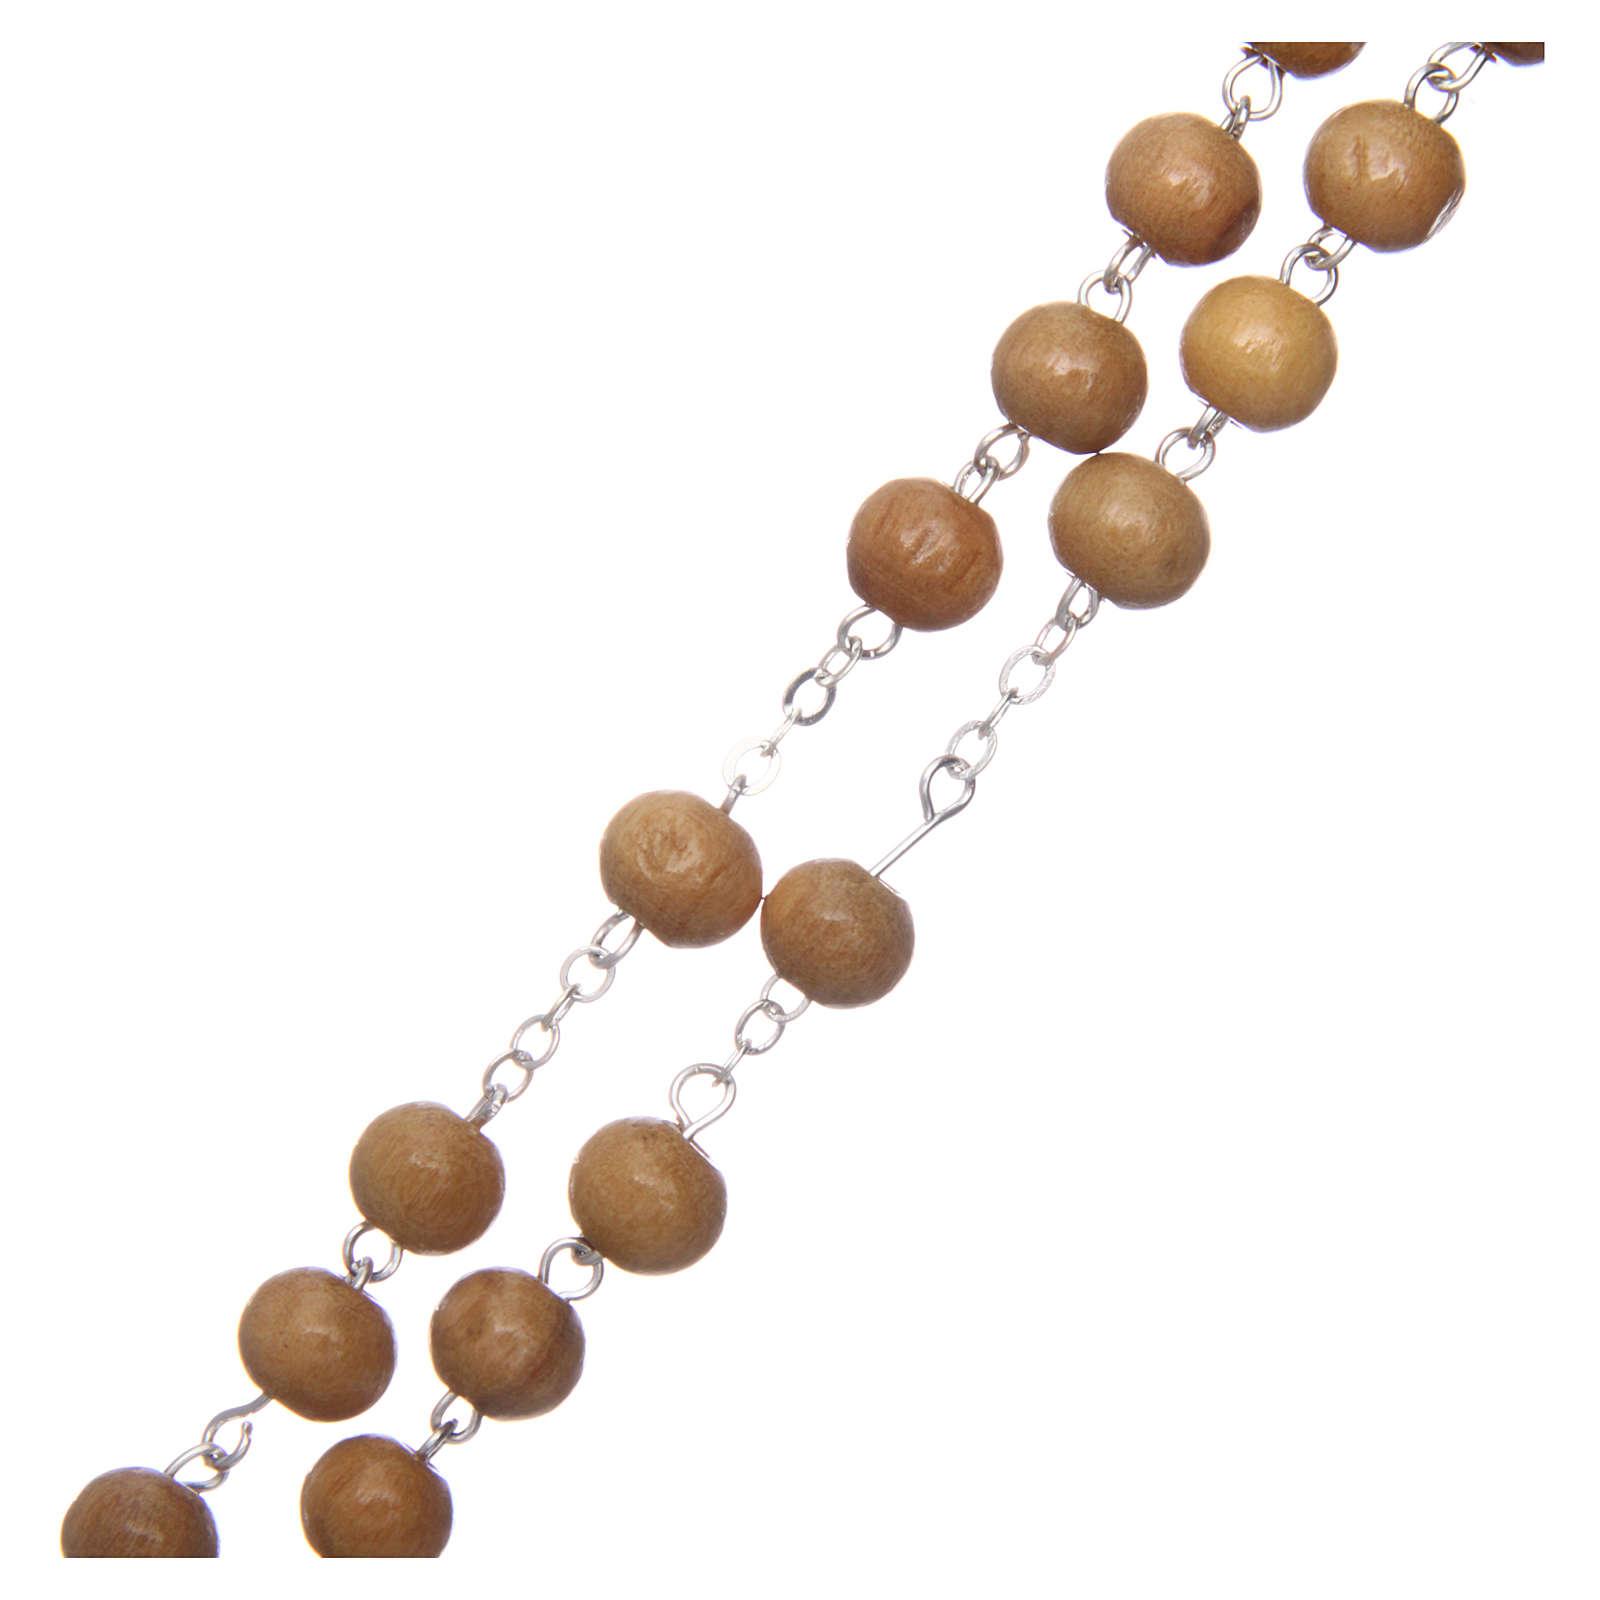 Chapelet en olivier véritable grains ronds 6 mm 4